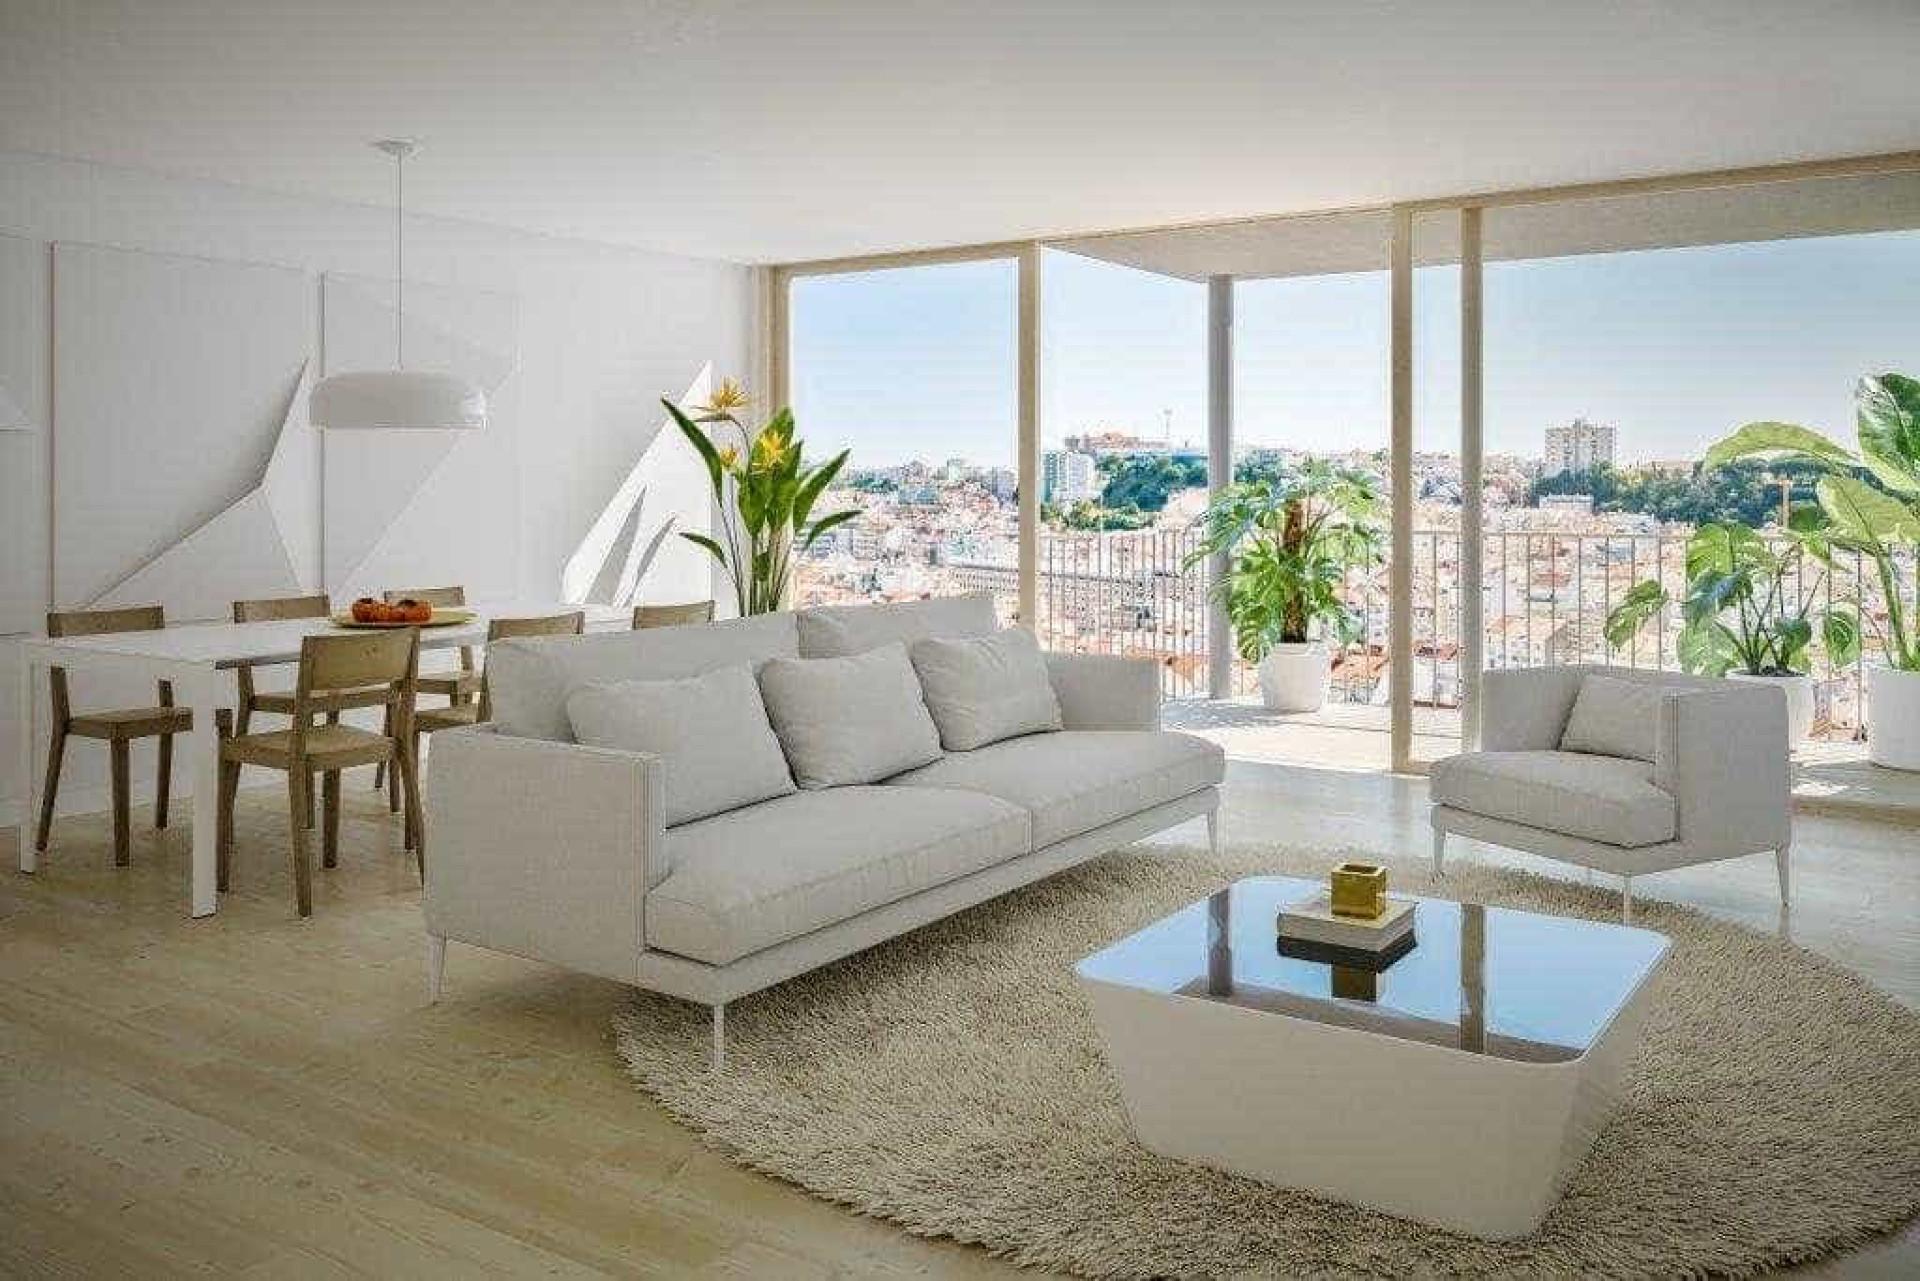 Scenic: Luxo e vista panorâmica nos novos apartamentos de Lisboa